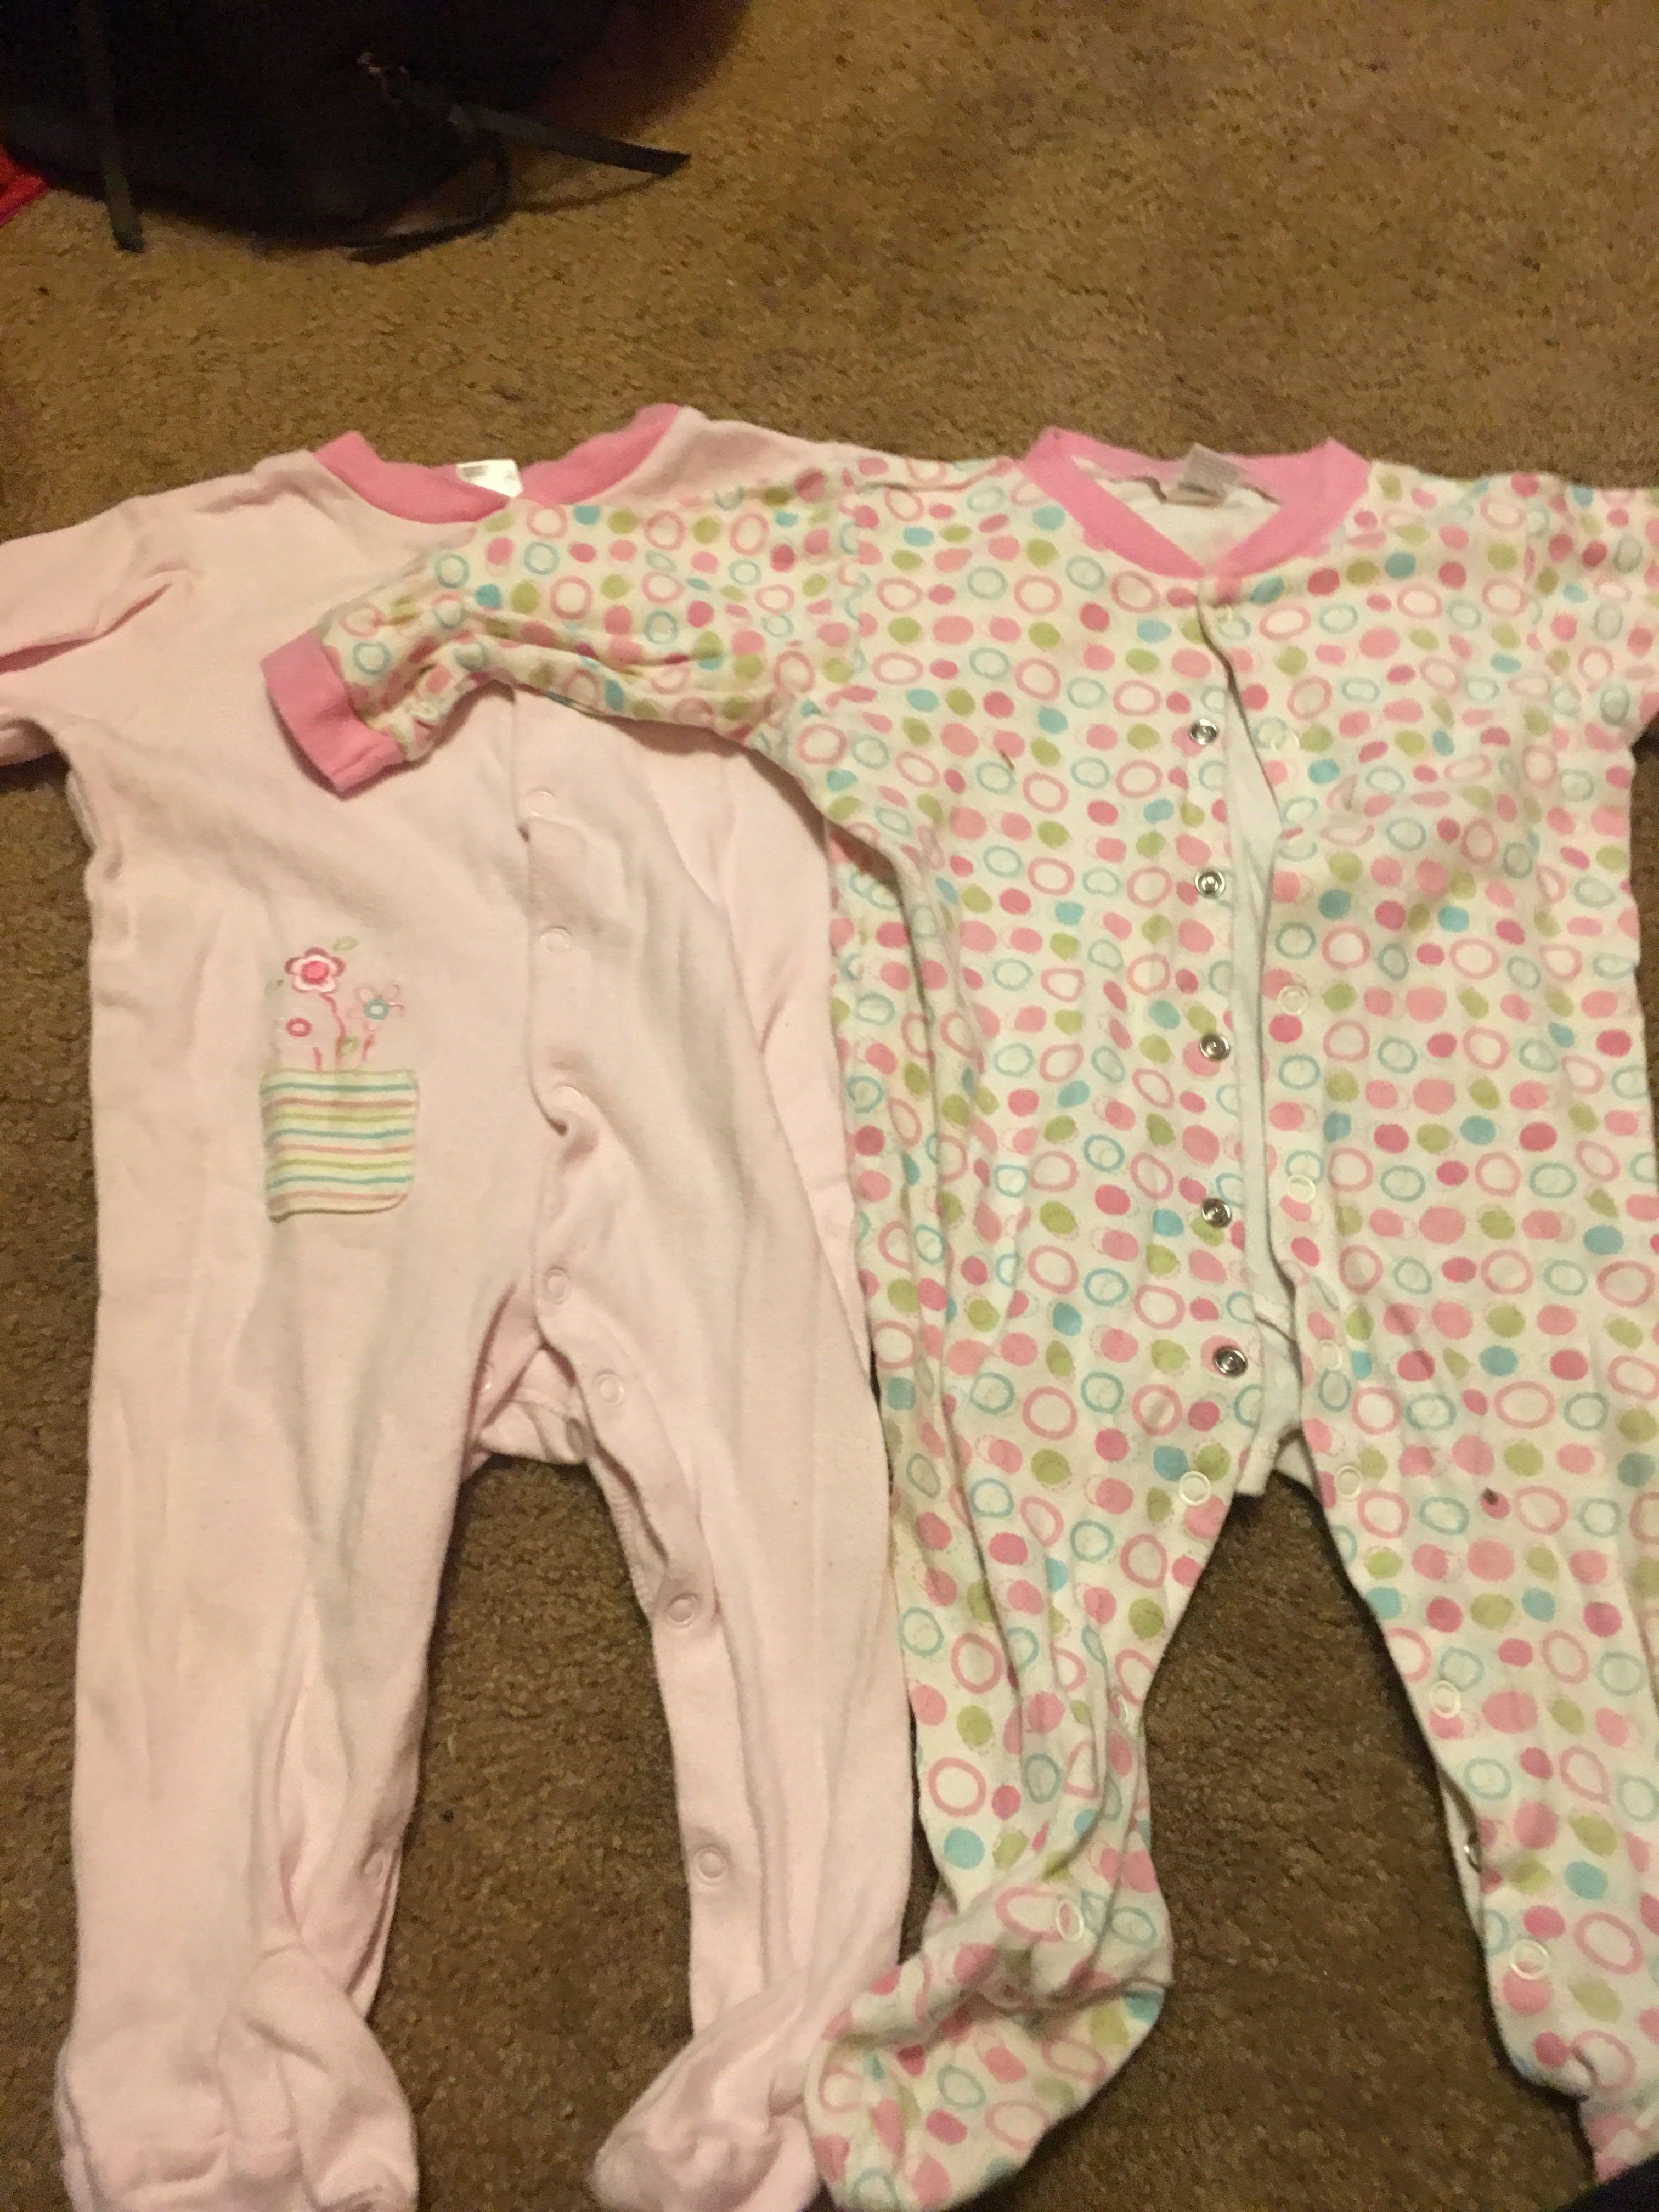 Babie night time onesies !!! 0-6 months